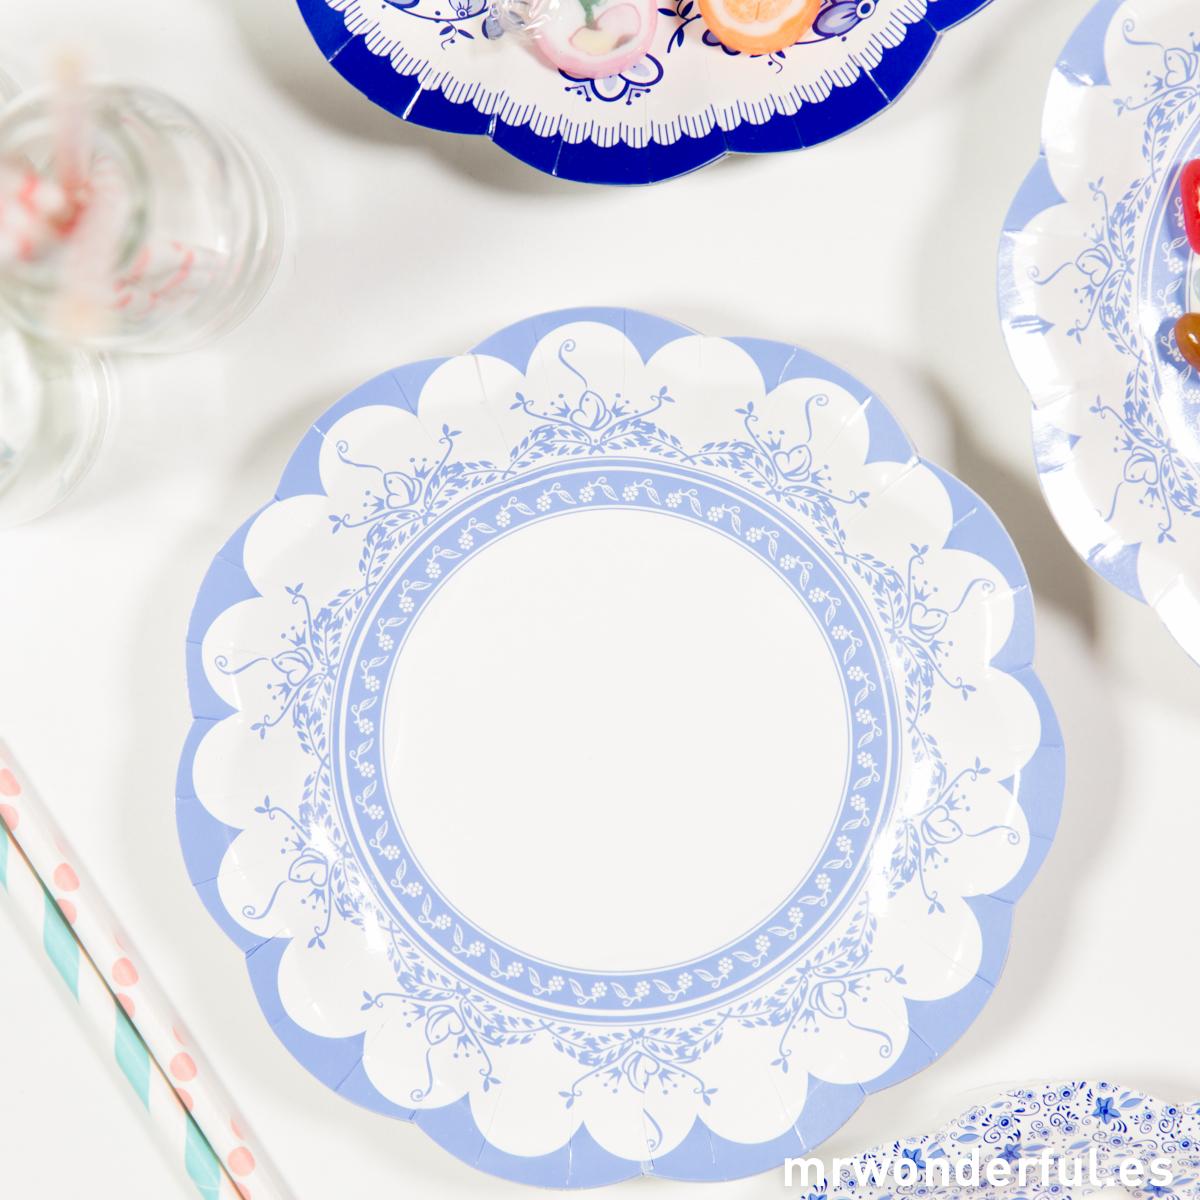 mrwonderful_PPB-PLATE-SML-Surtido-platos-pequeños-papel-estampado-porcelana-4